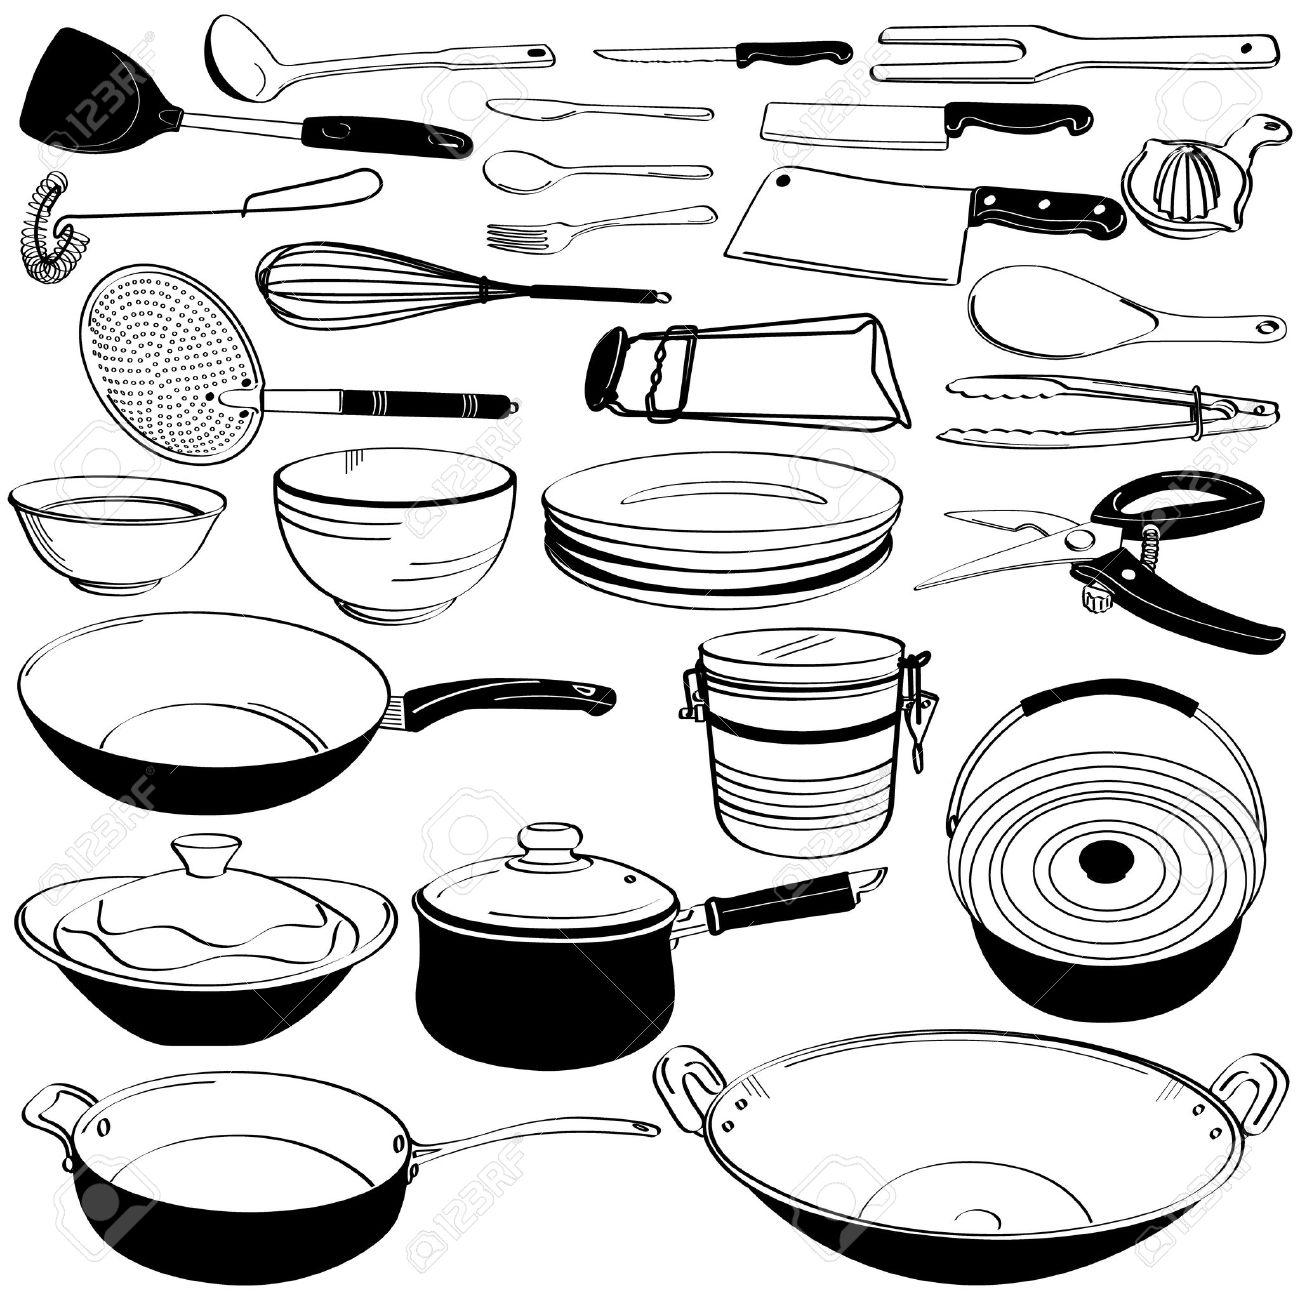 Kitchen tool utensil equipment doodle drawing sketch stock vector 11102683